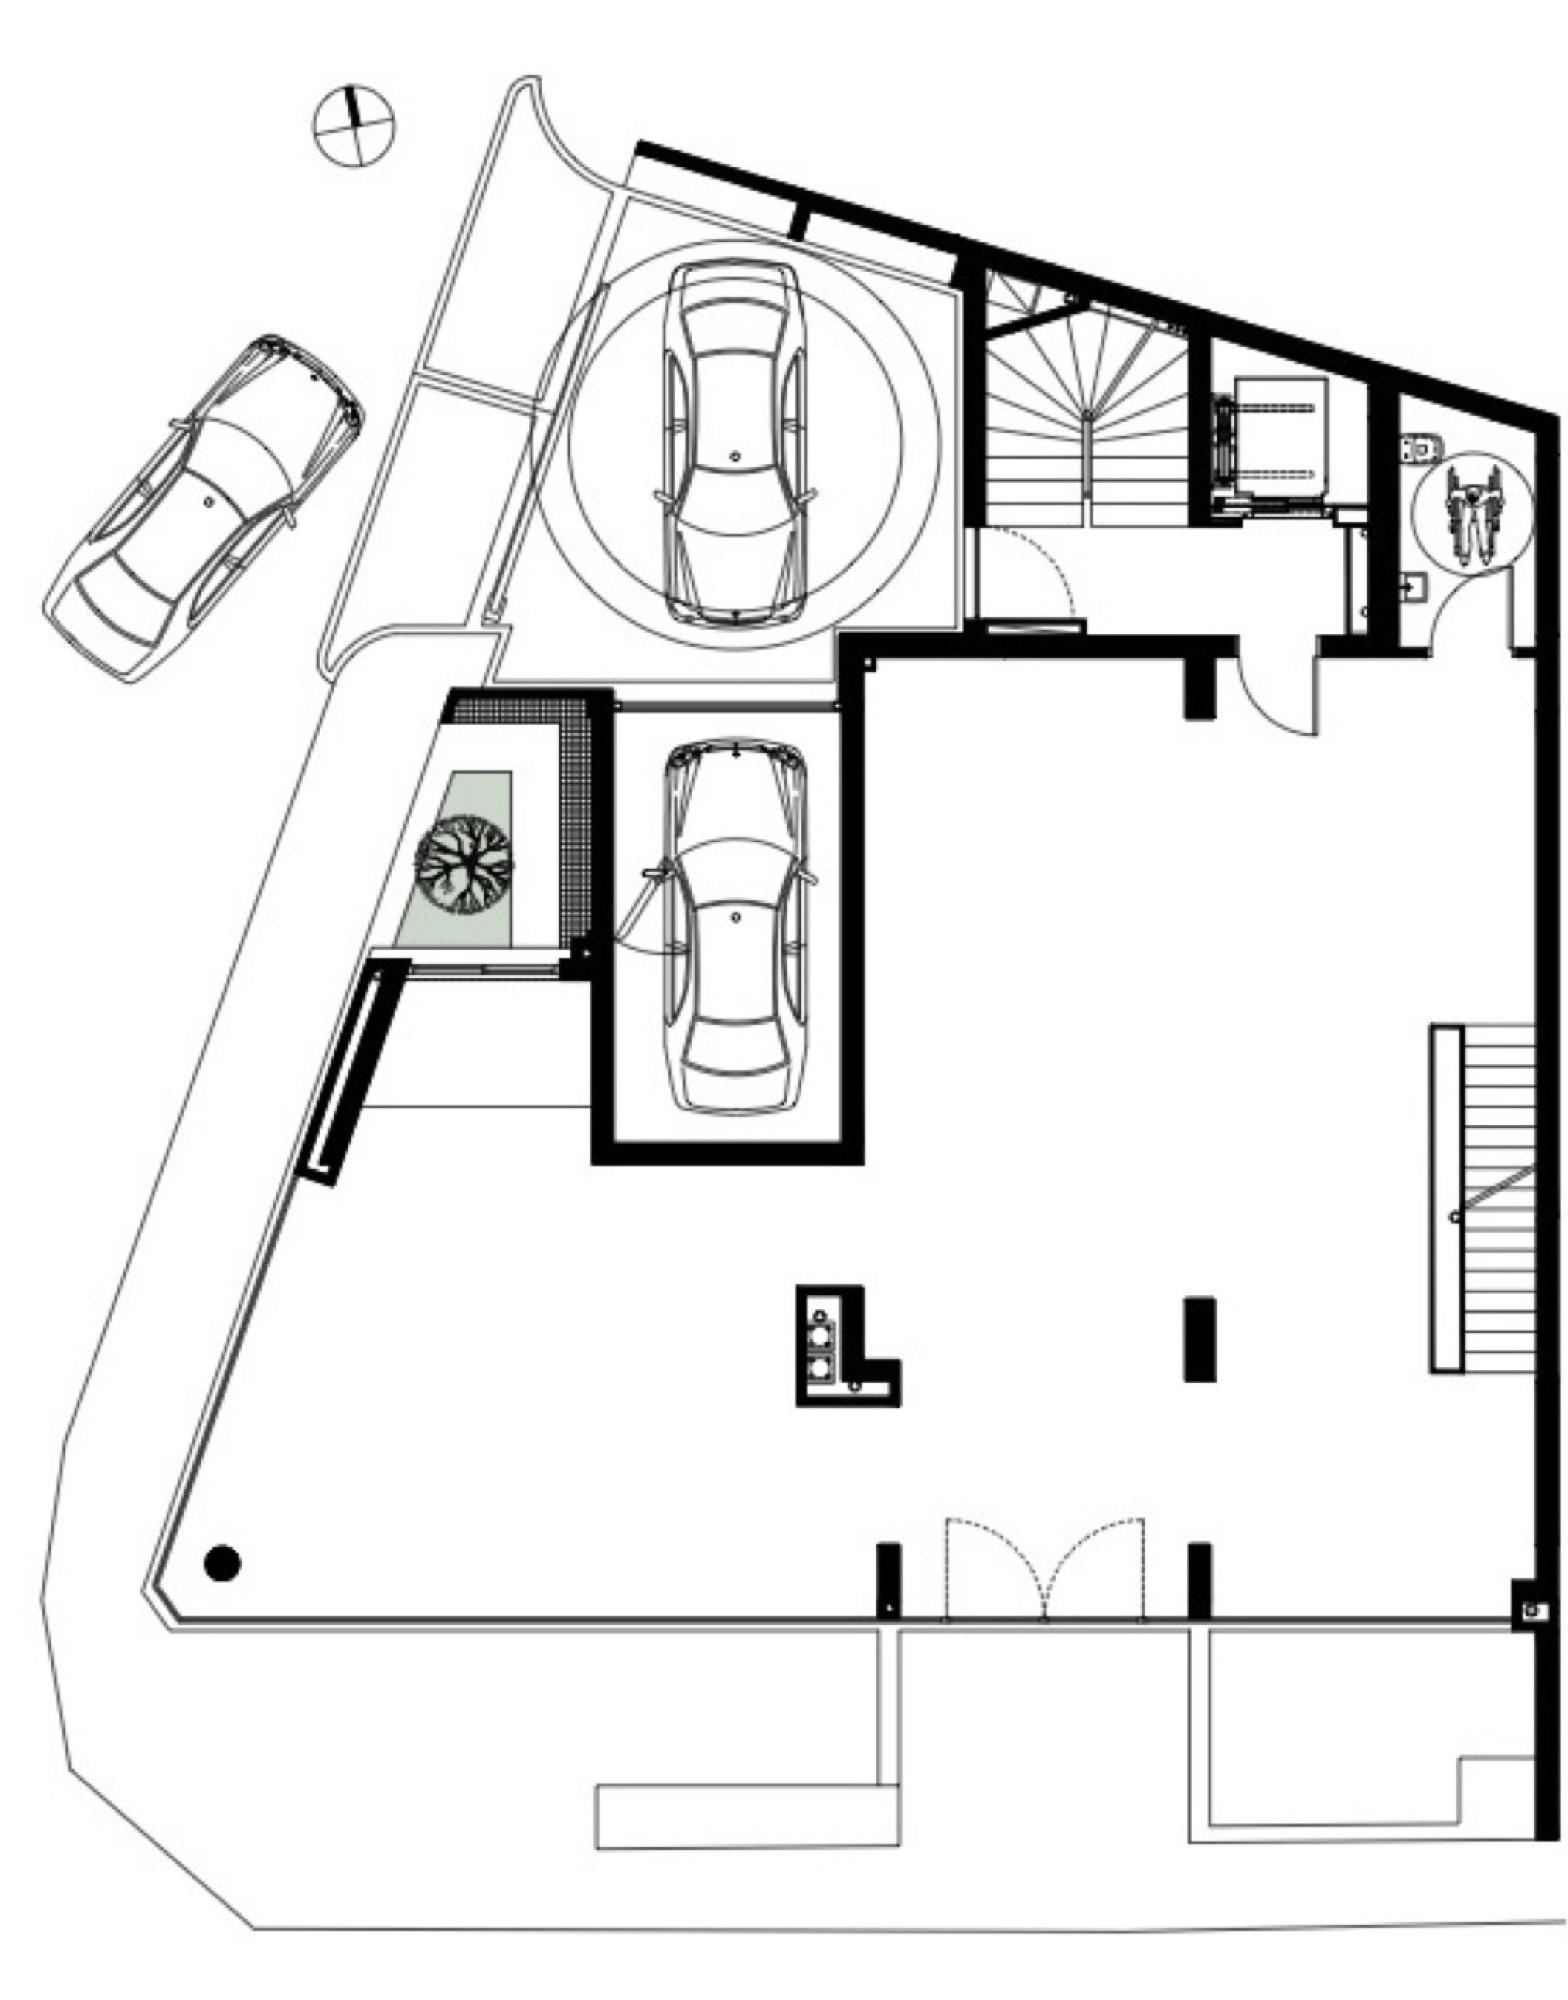 Architecture photography ground floor plan 176790 for Urban loft floor plan